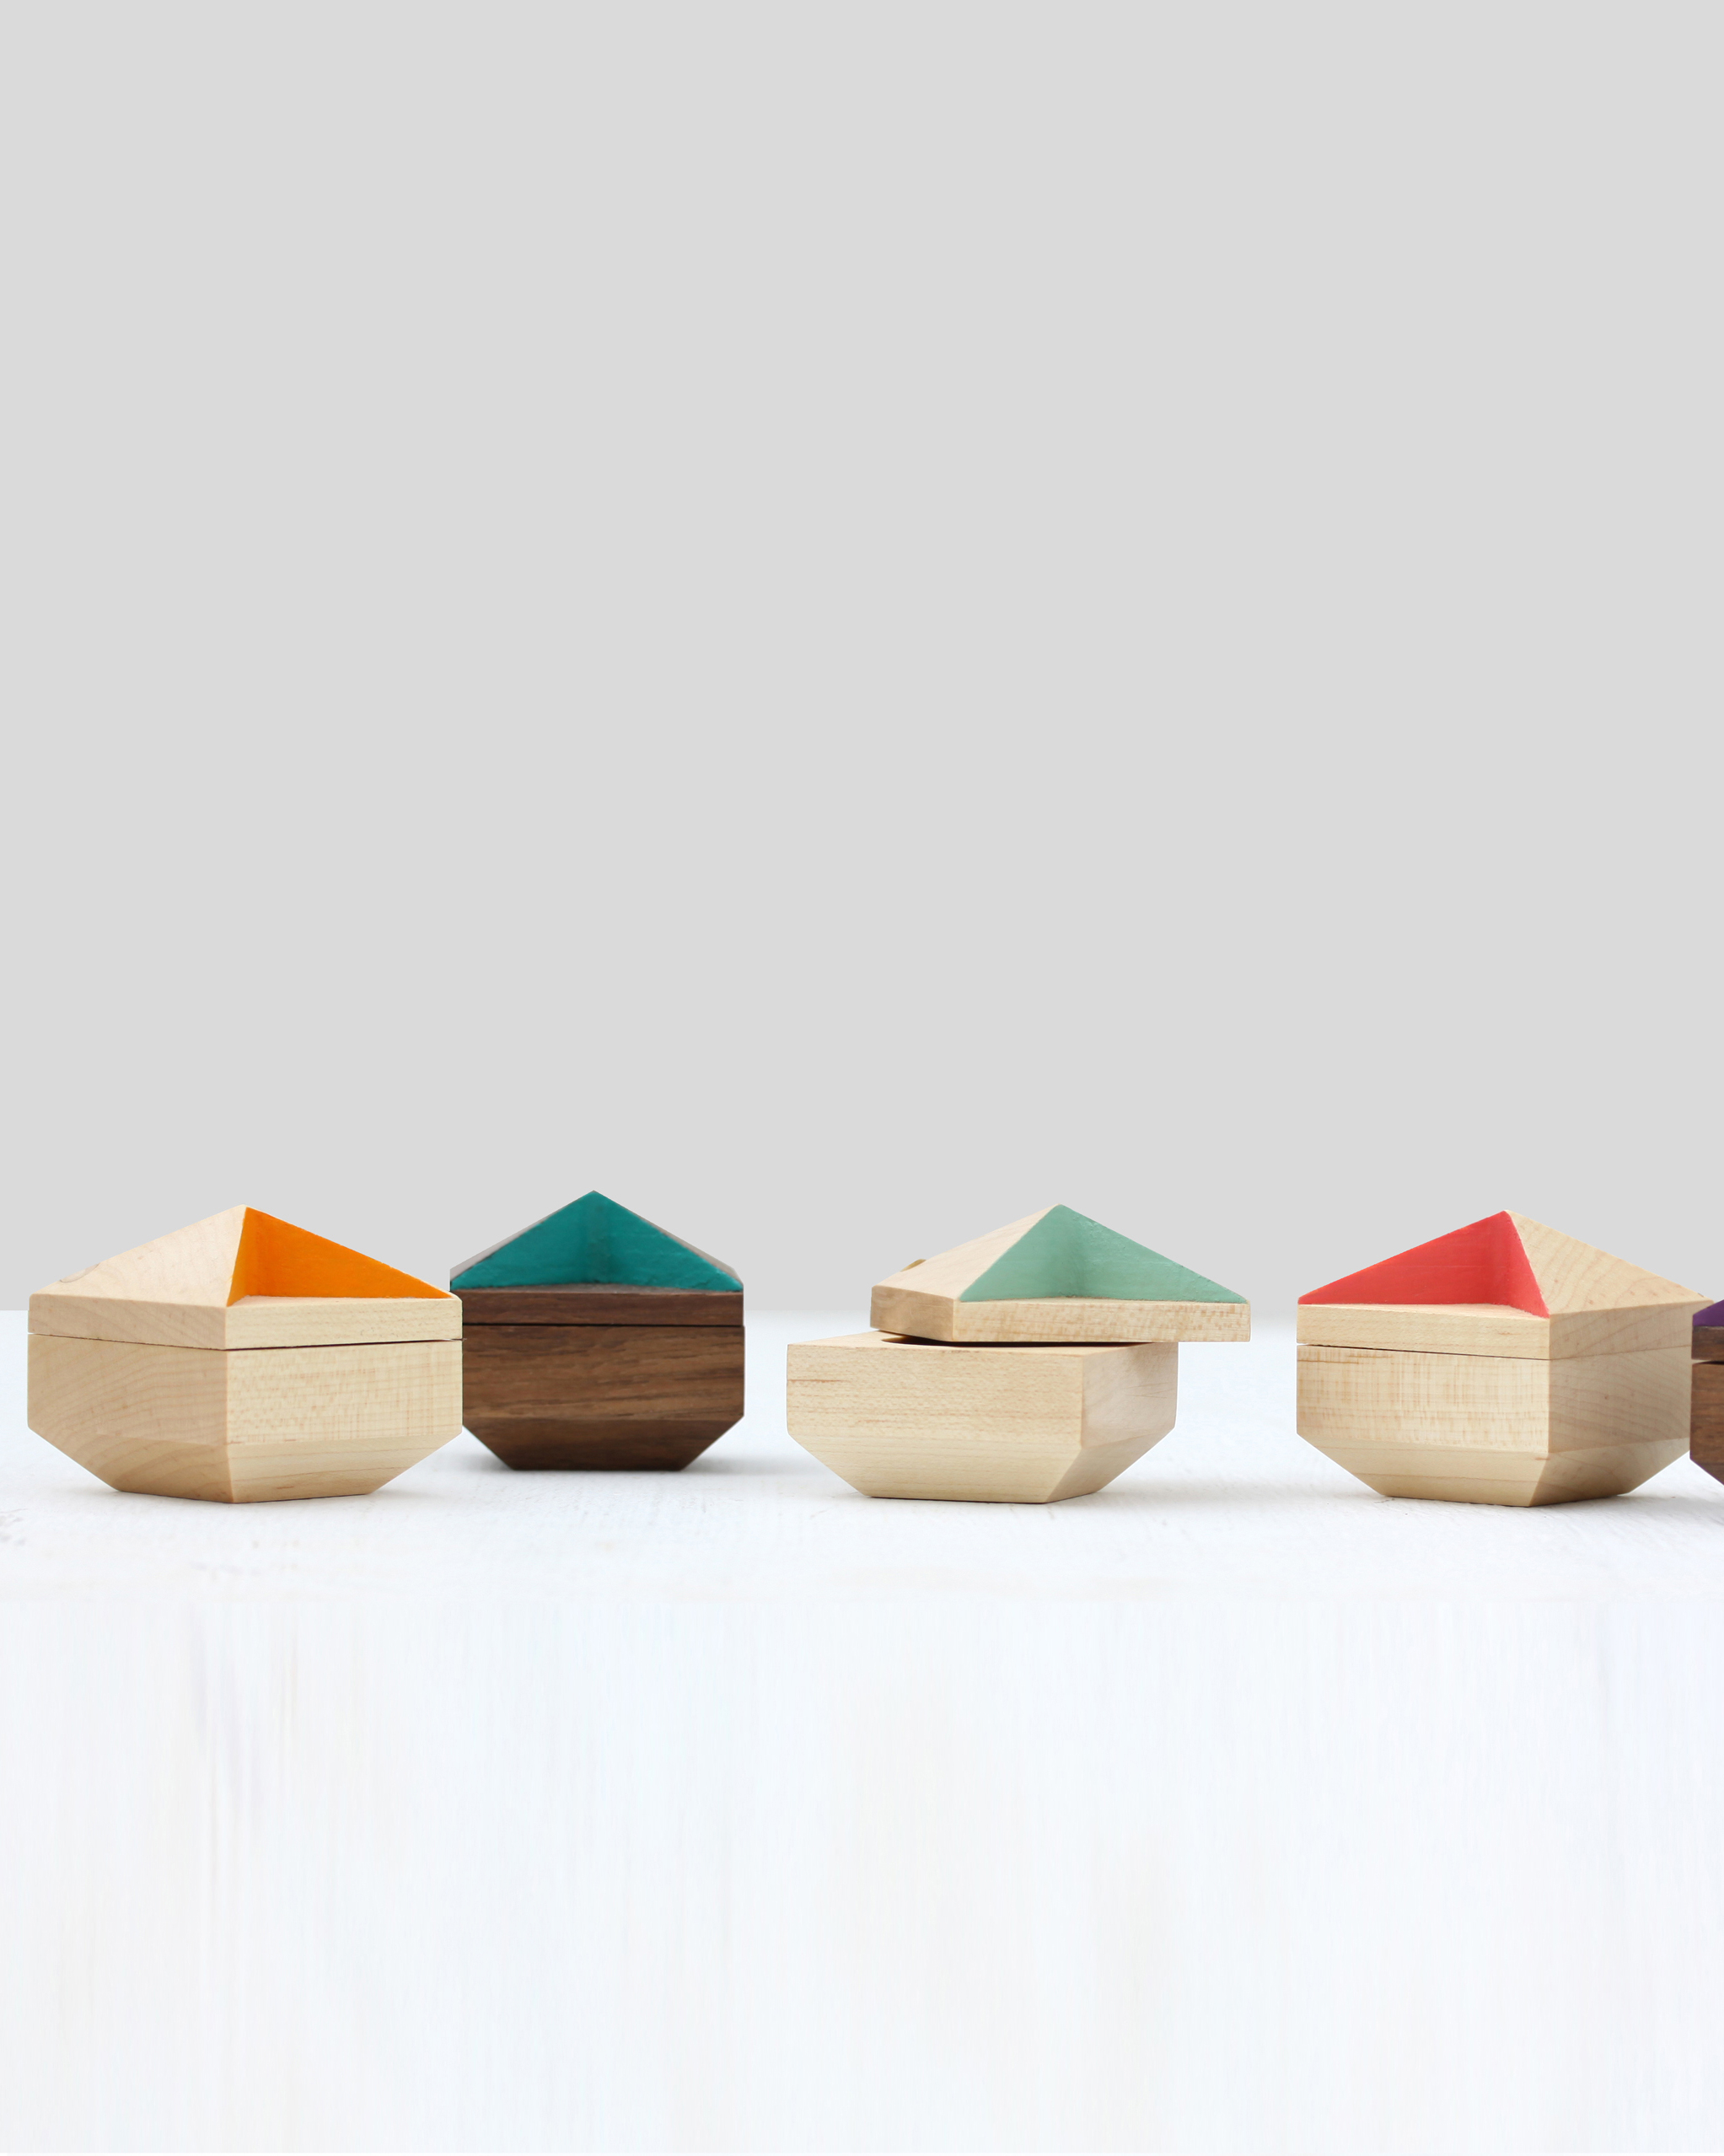 ring-boxes-oh-dier-pixie-0115.jpg